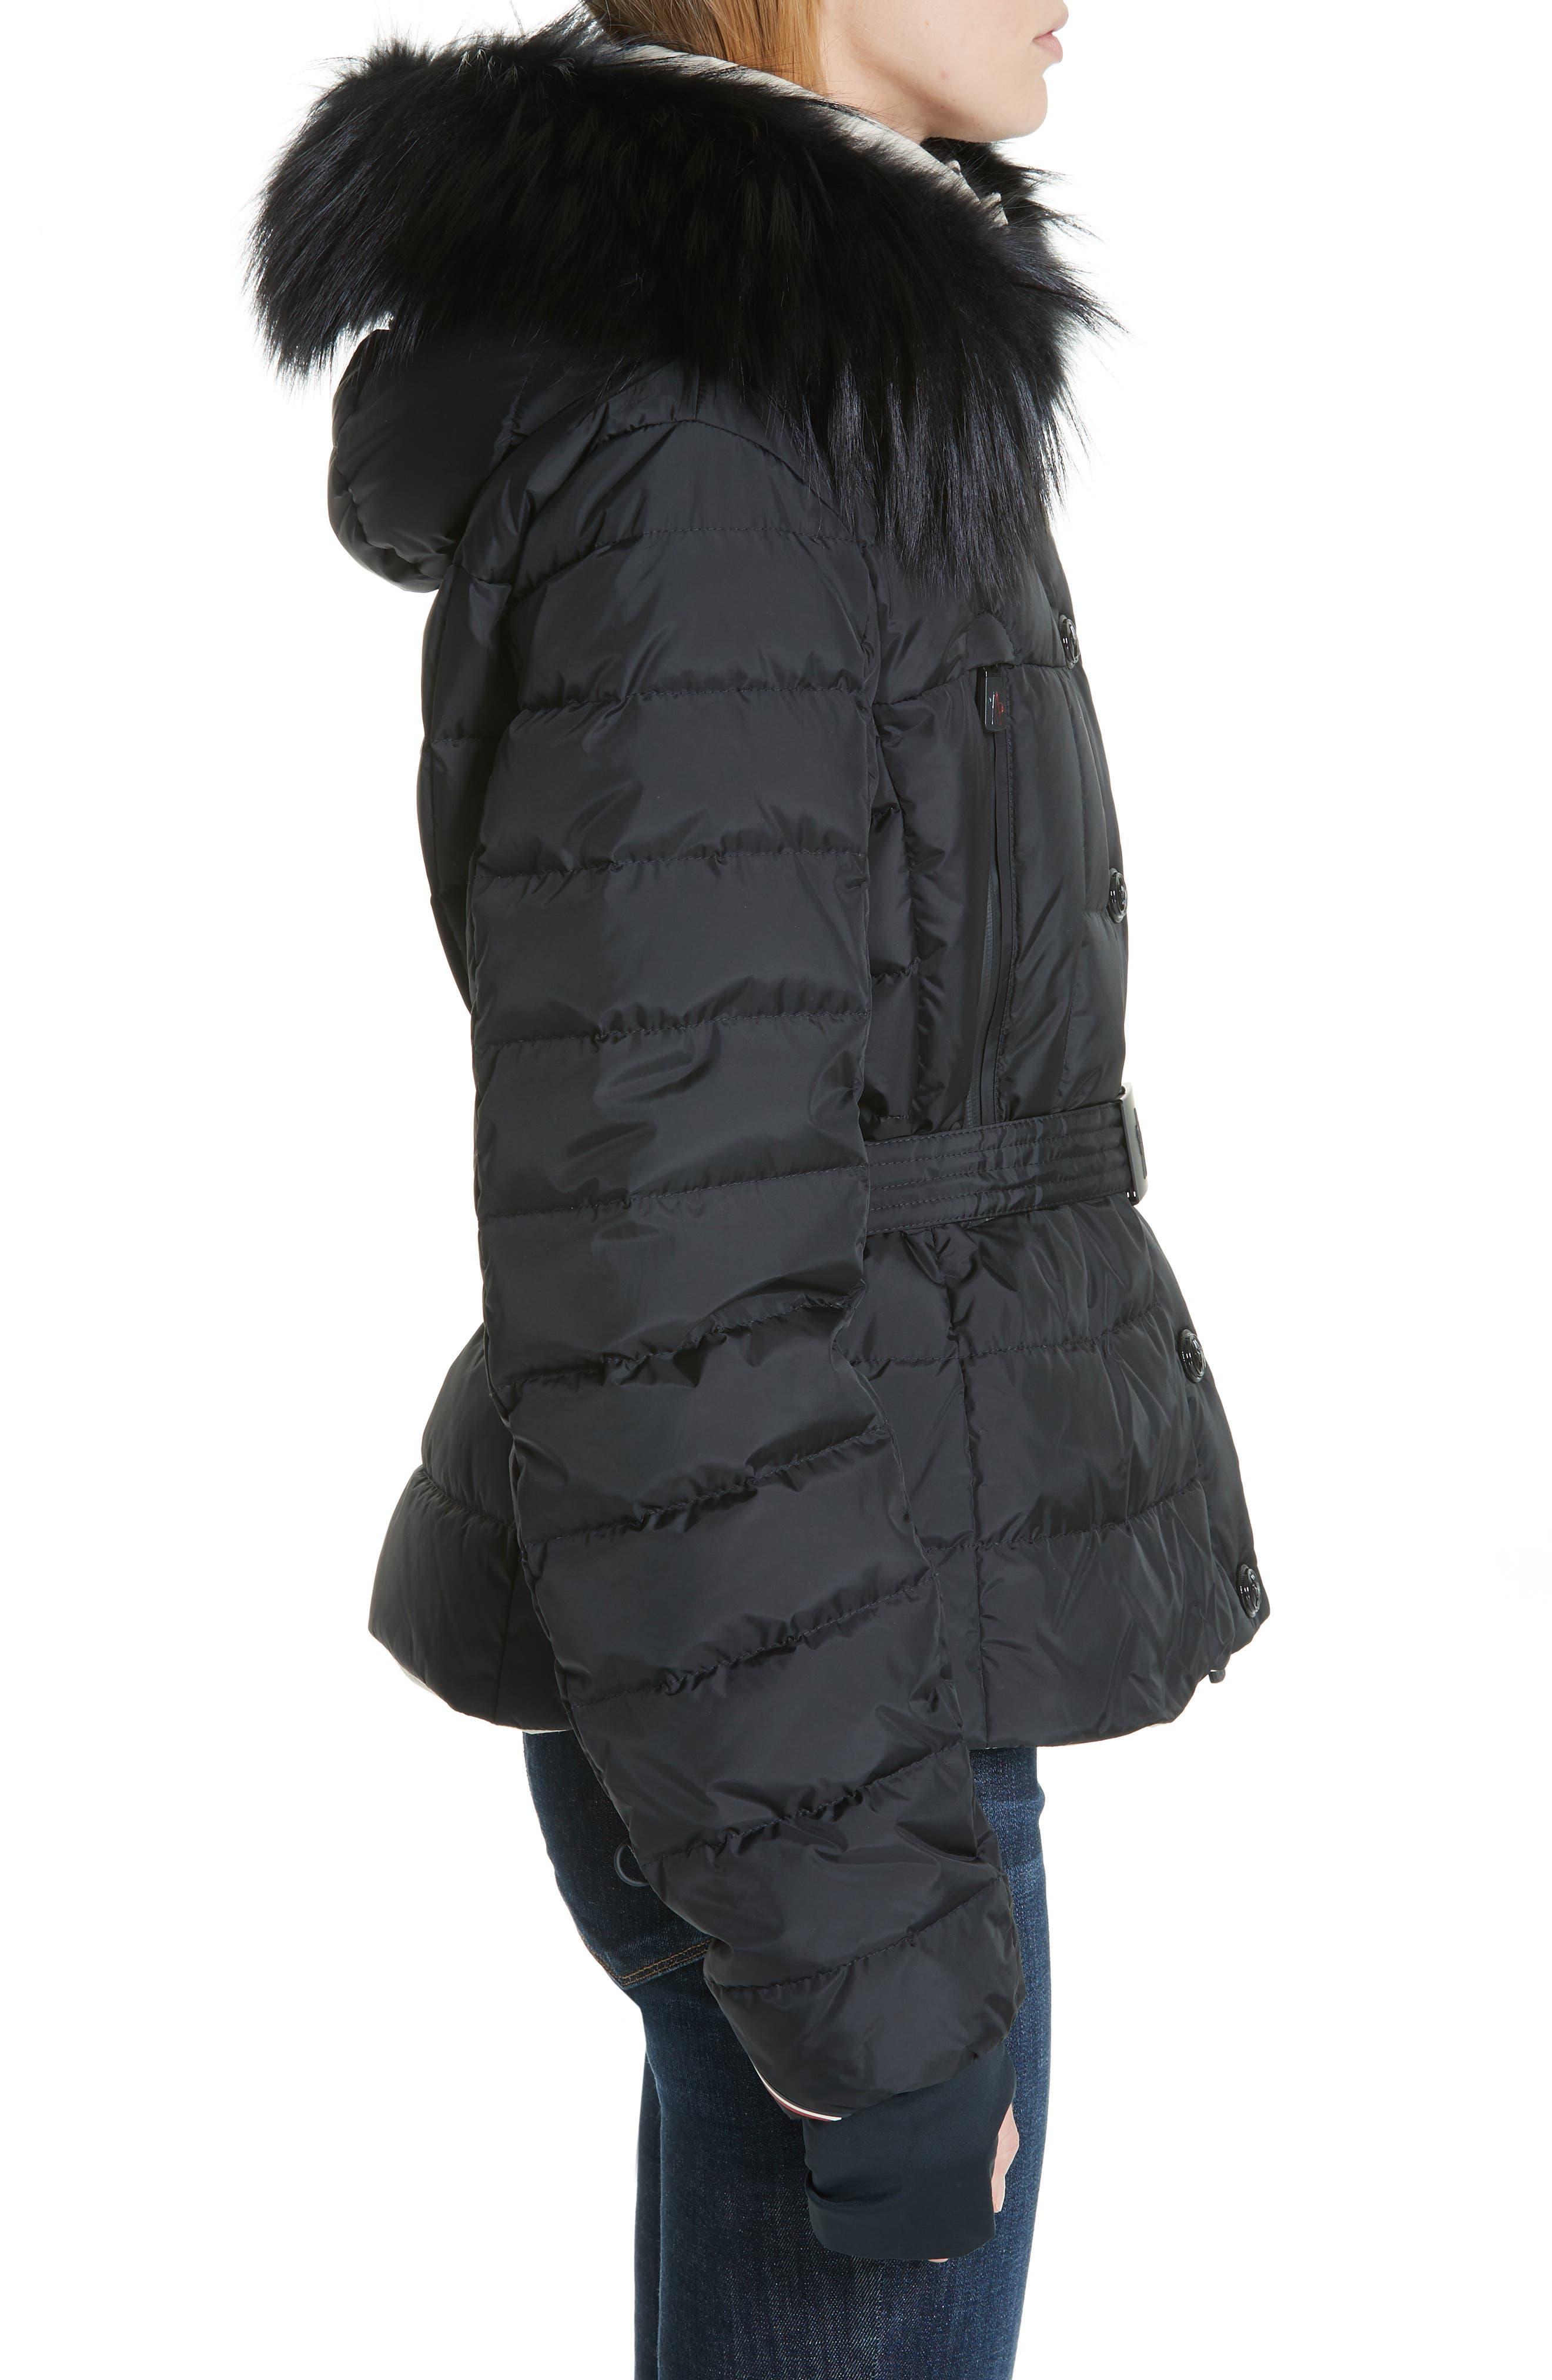 MONCLER, Beverley Genuine Fox Fur Trim Quilted Down Coat, Alternate thumbnail 3, color, 001